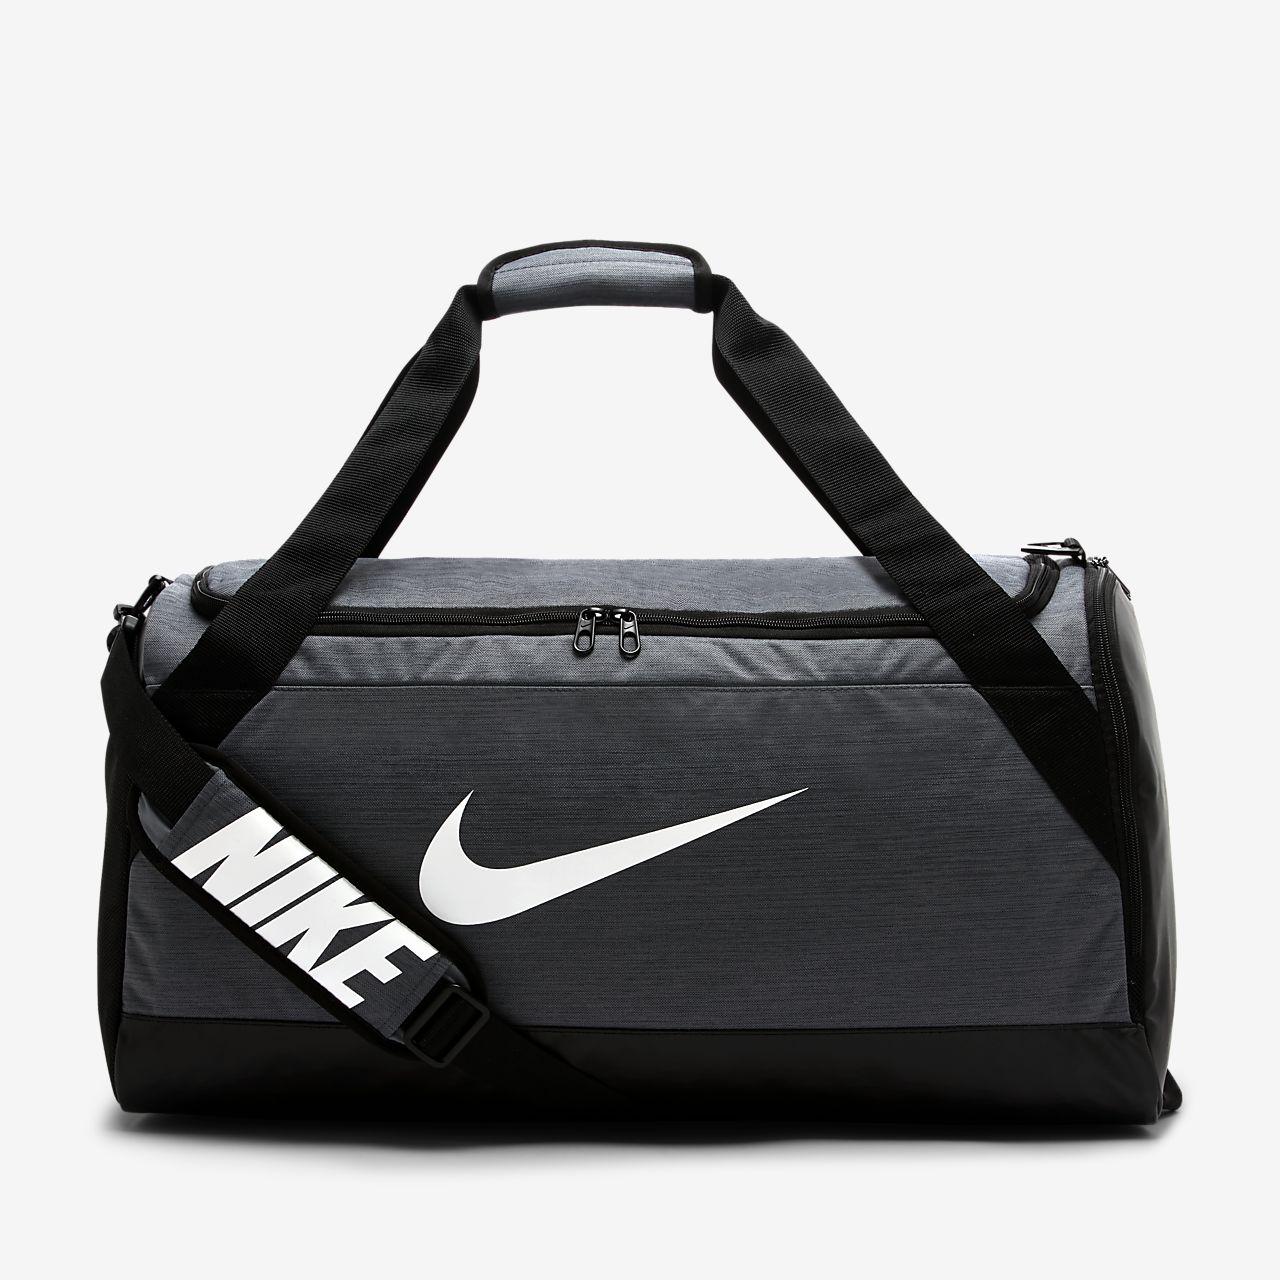 Sac de sport de training Nike Brasilia (taille moyenne)